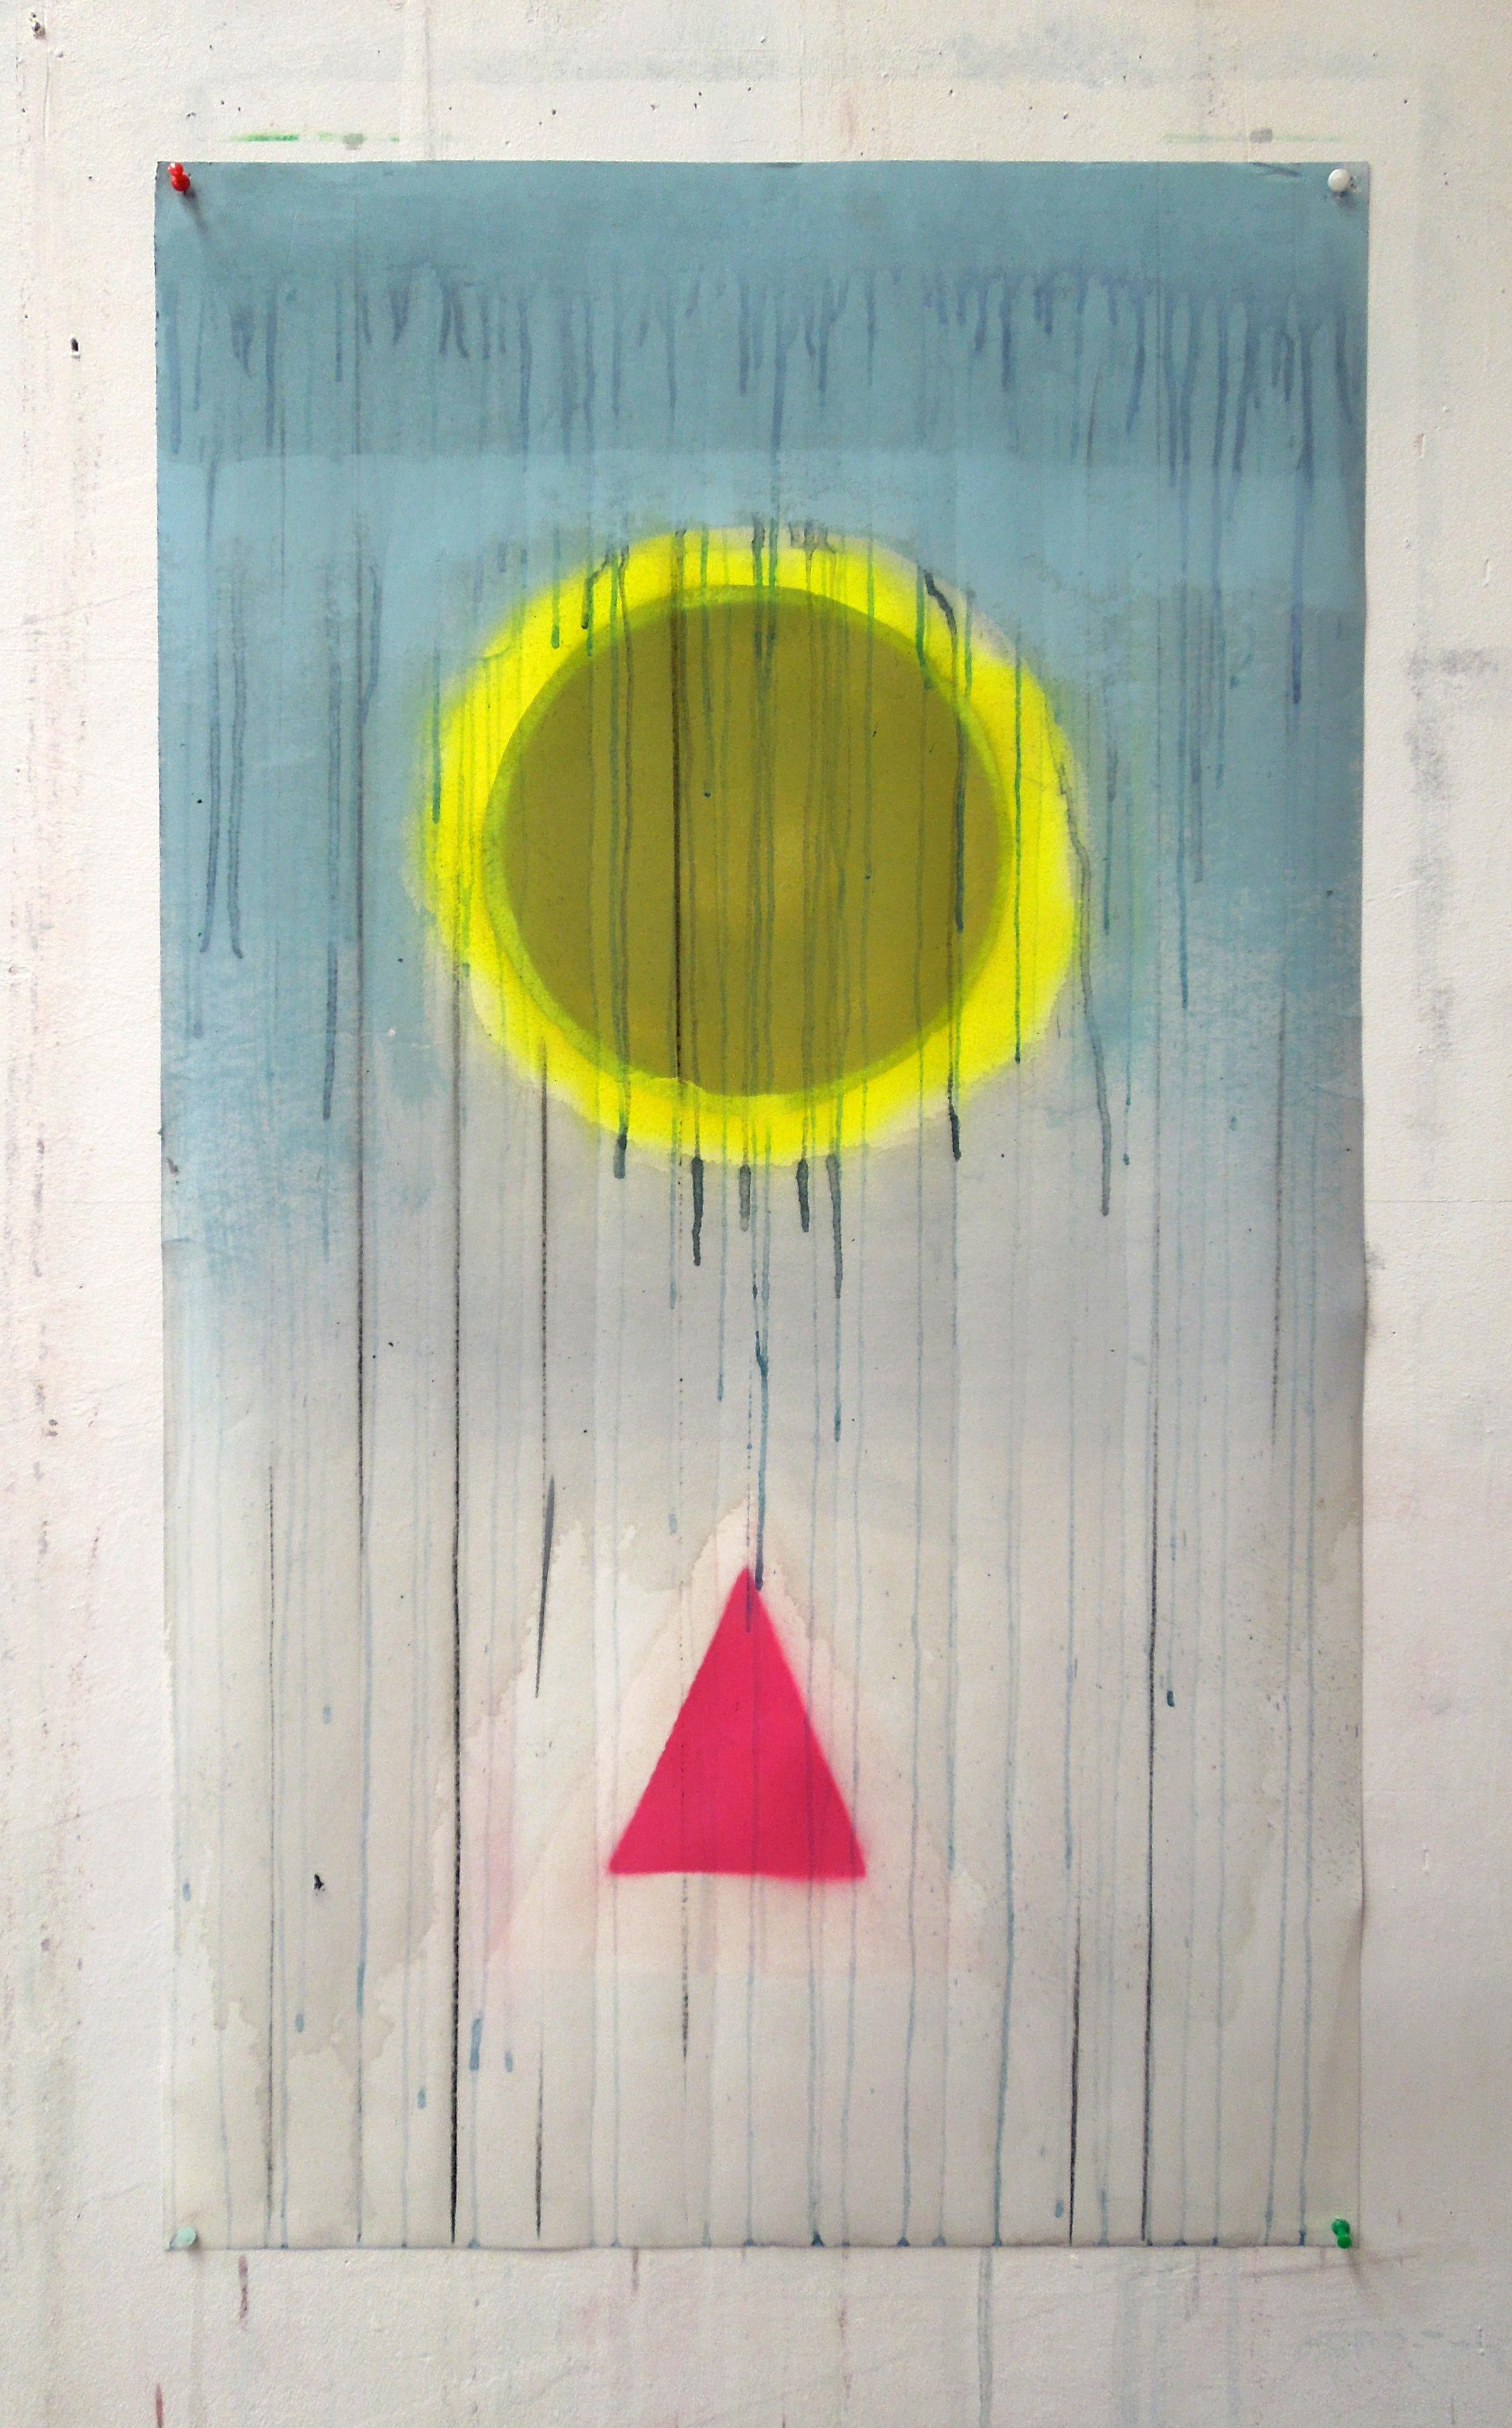 abovebelow(yellowandpink)2016mixedmediaonpaper100x58cm